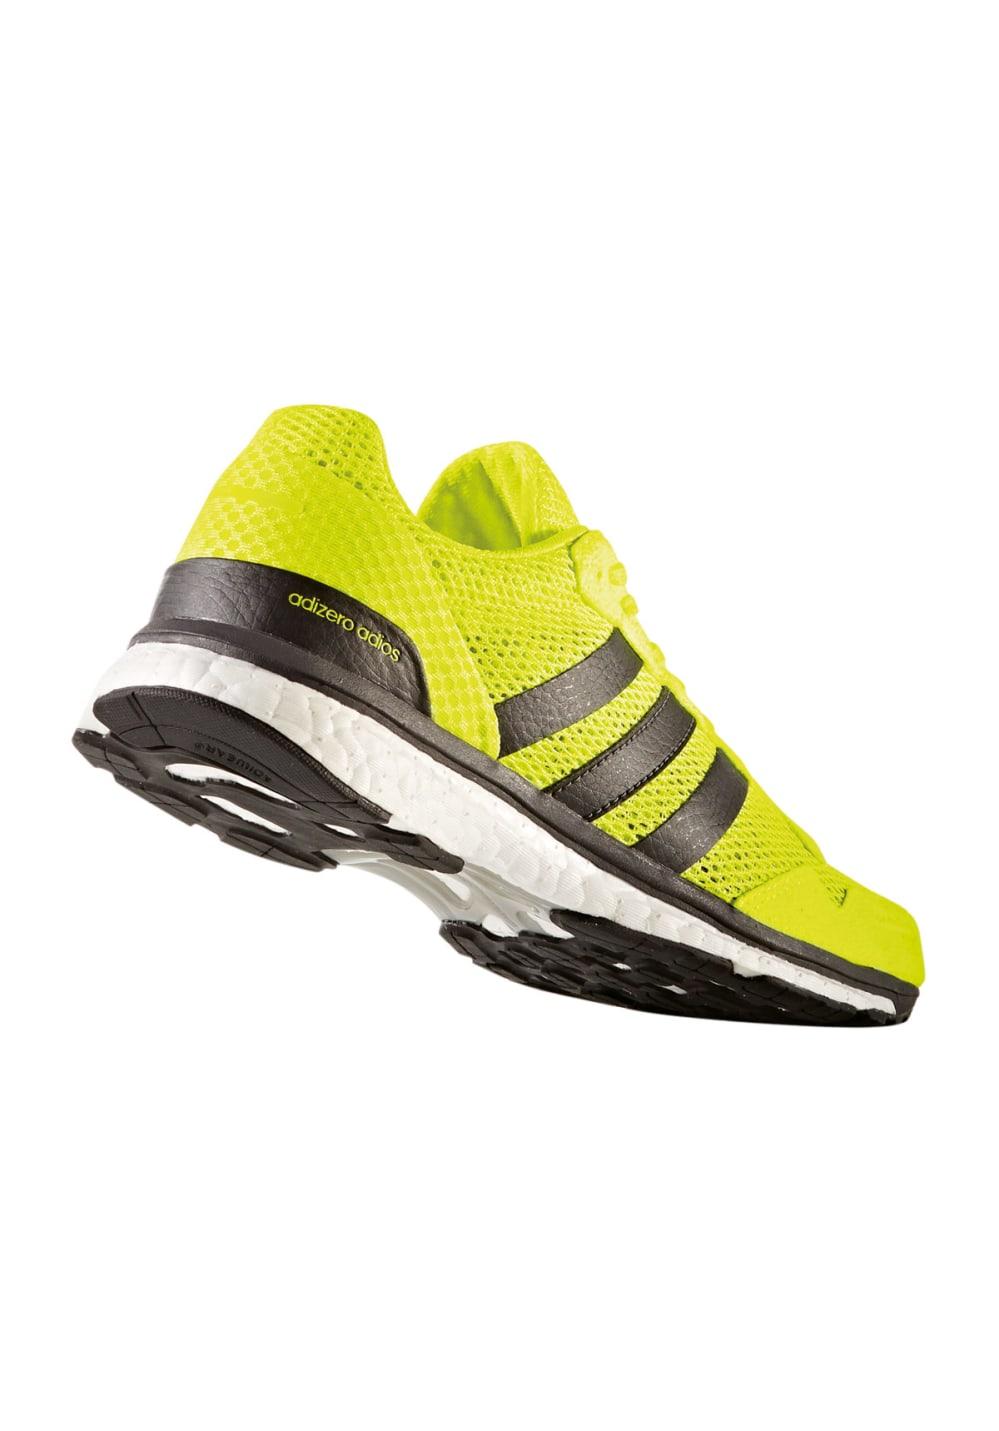 adidas adizero Adios 3 - Laufschuhe für Damen - Gelb